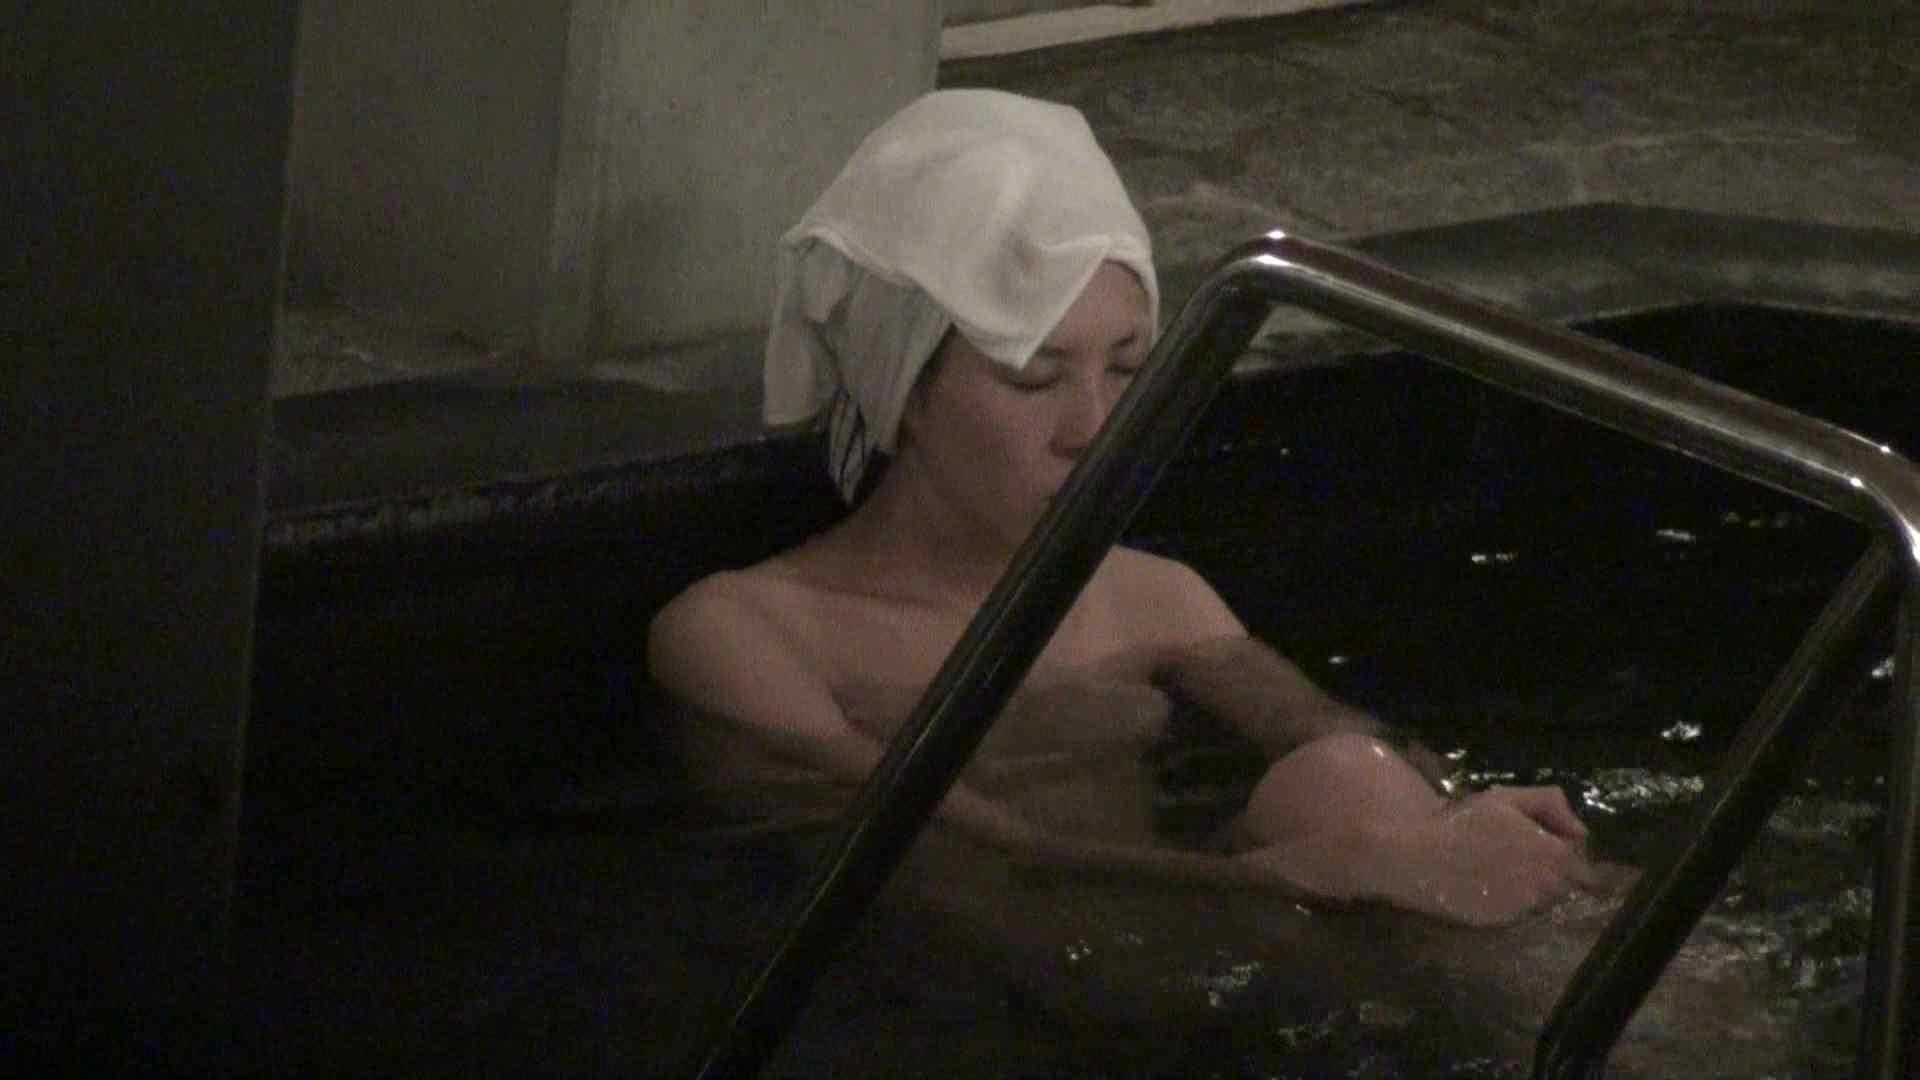 Aquaな露天風呂Vol.358 OLのエロ生活 おまんこ無修正動画無料 50連発 20